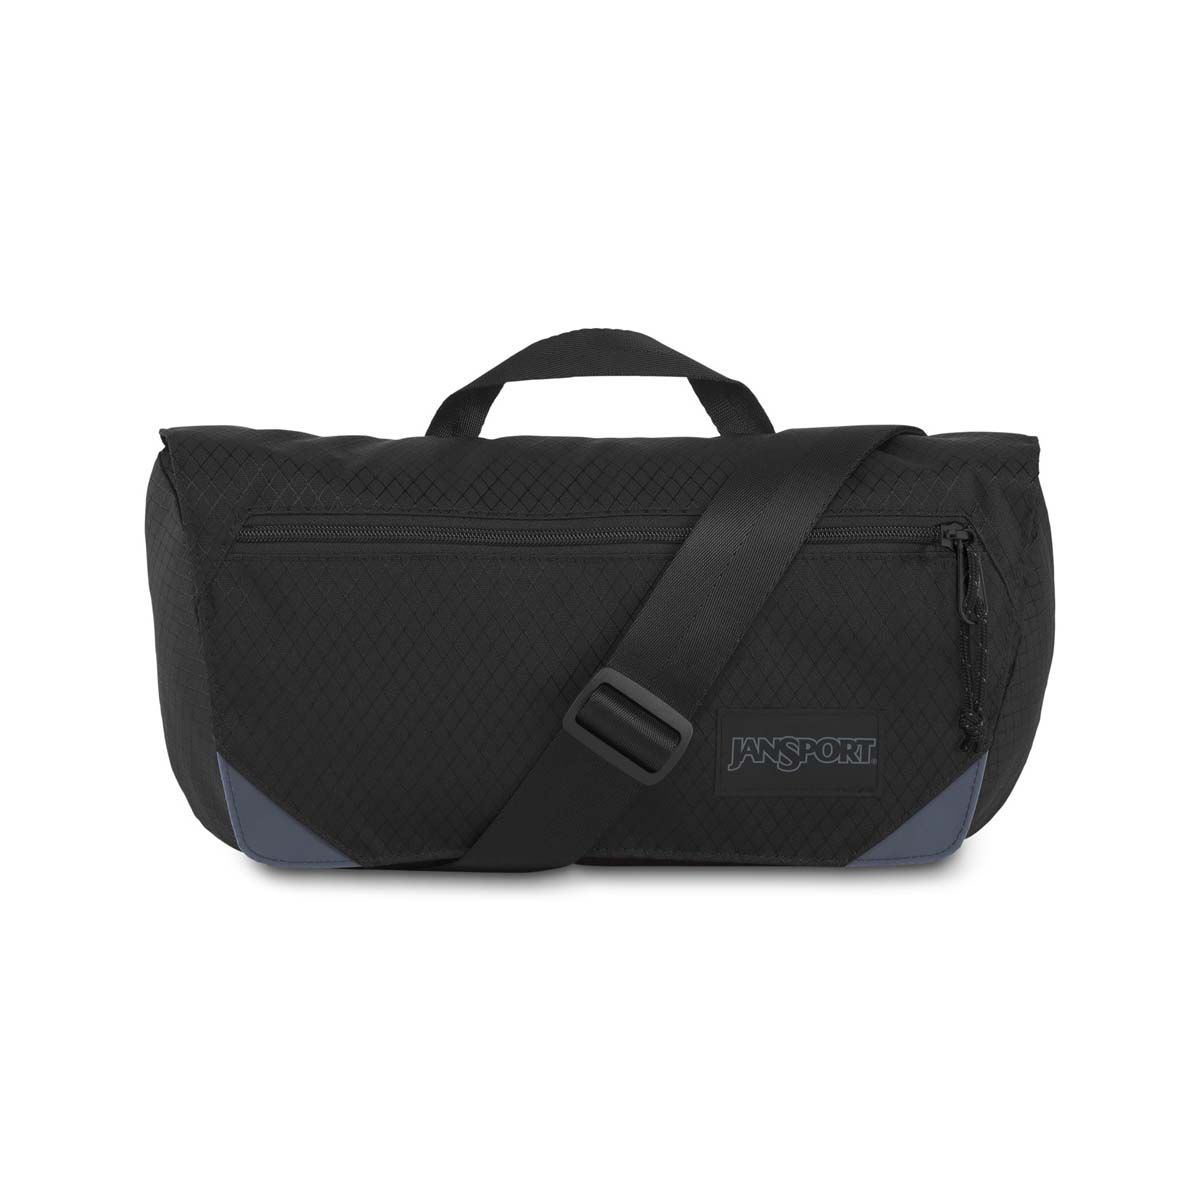 JanSport Street Sling Crossbody Bag in Black Top